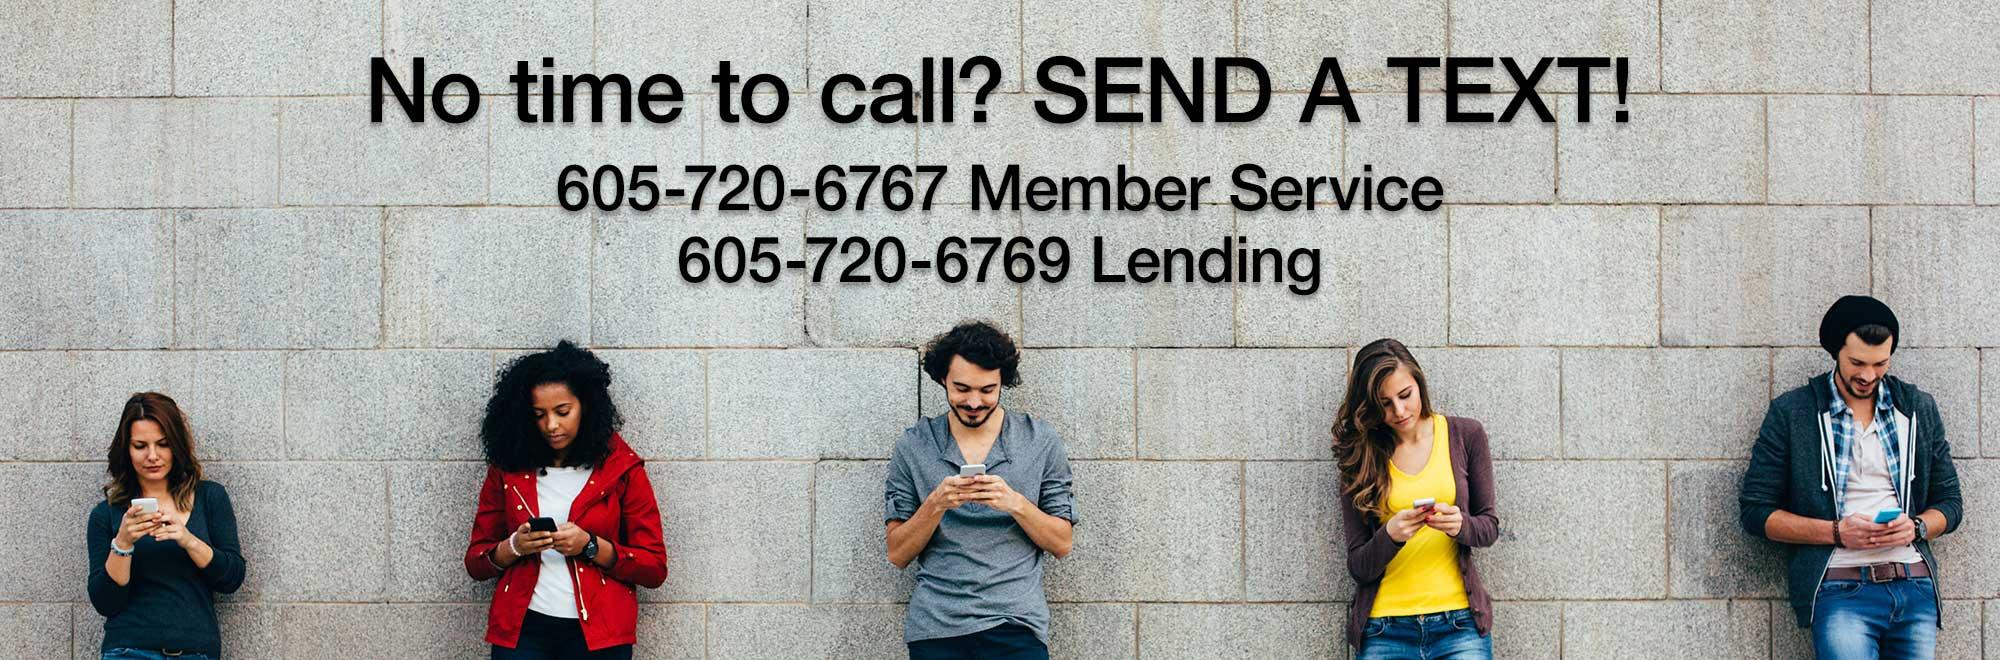 2018 Send a Text